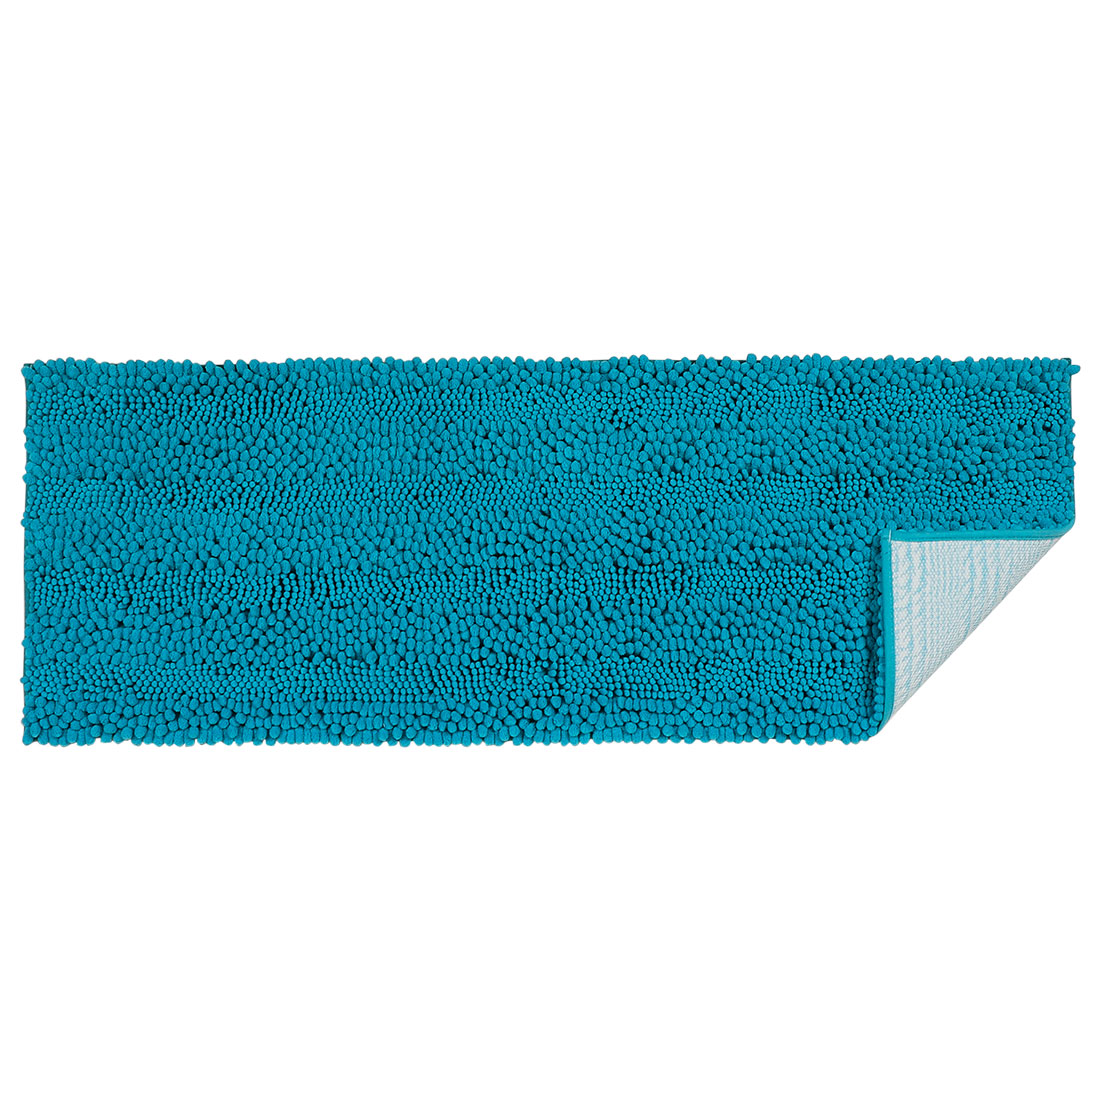 17 x 47 Inch Luxury Soft Plush Shaggy Bath Mat Chenille Rug Carpet Blue